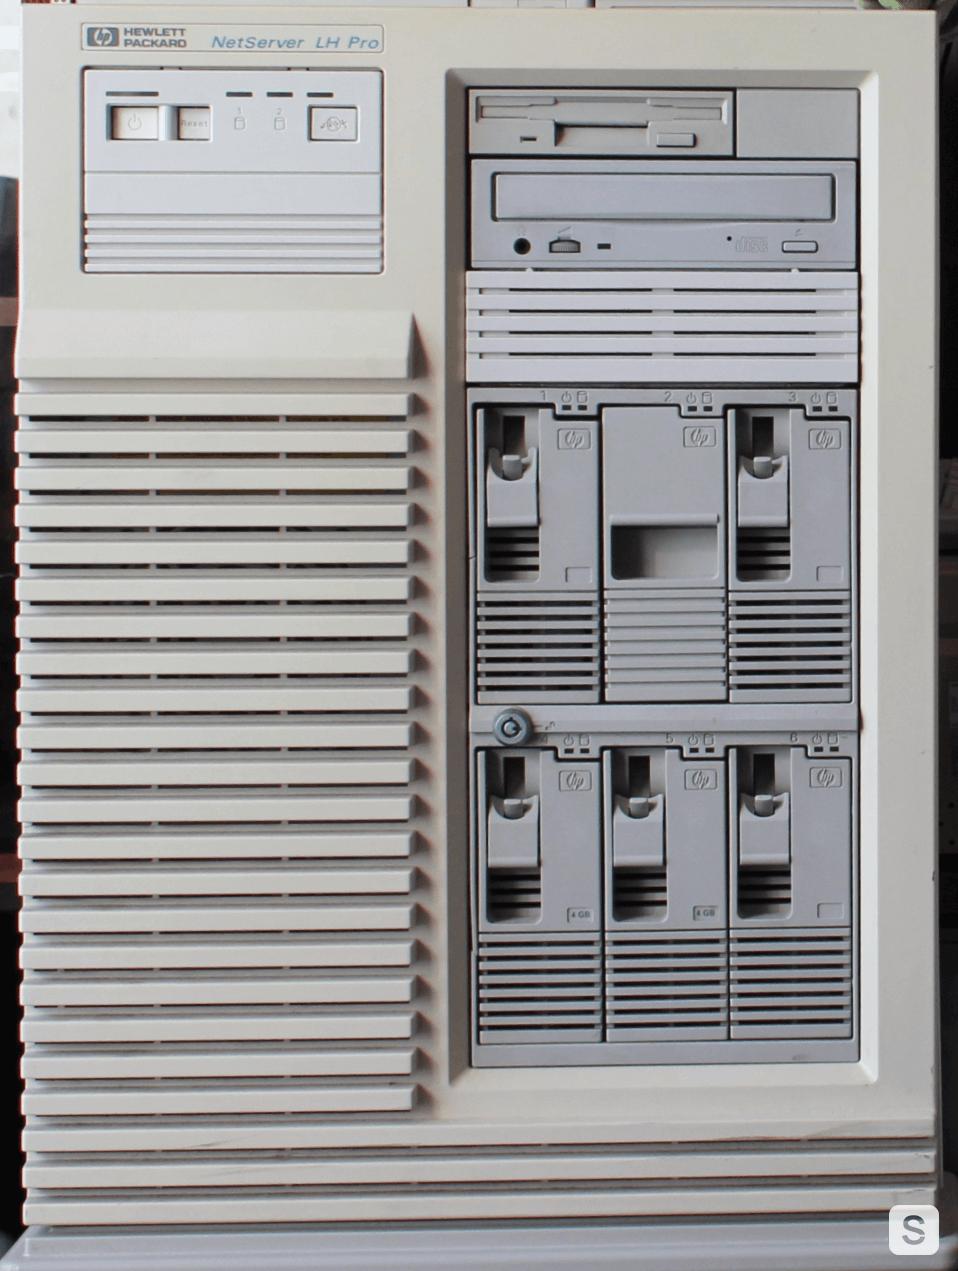 Cubique reloaded. Обзор сервера HP NetServer LH Pro - 20